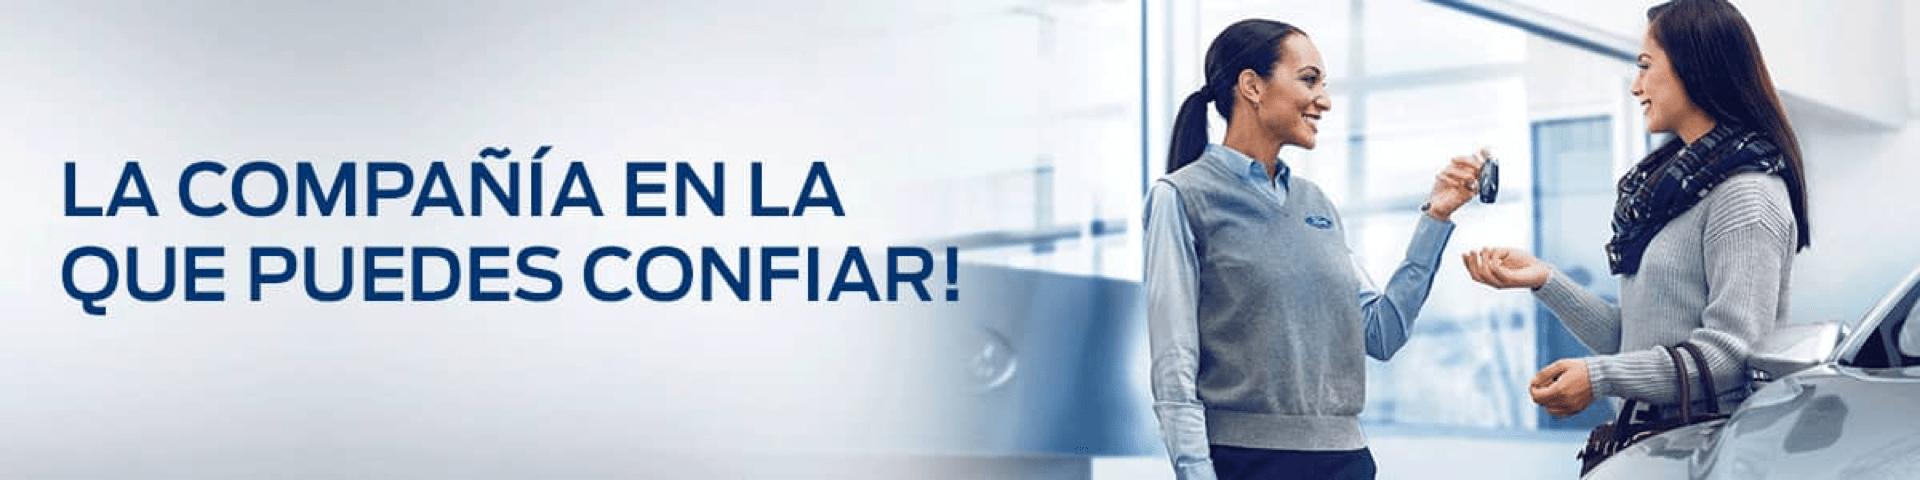 spanish header